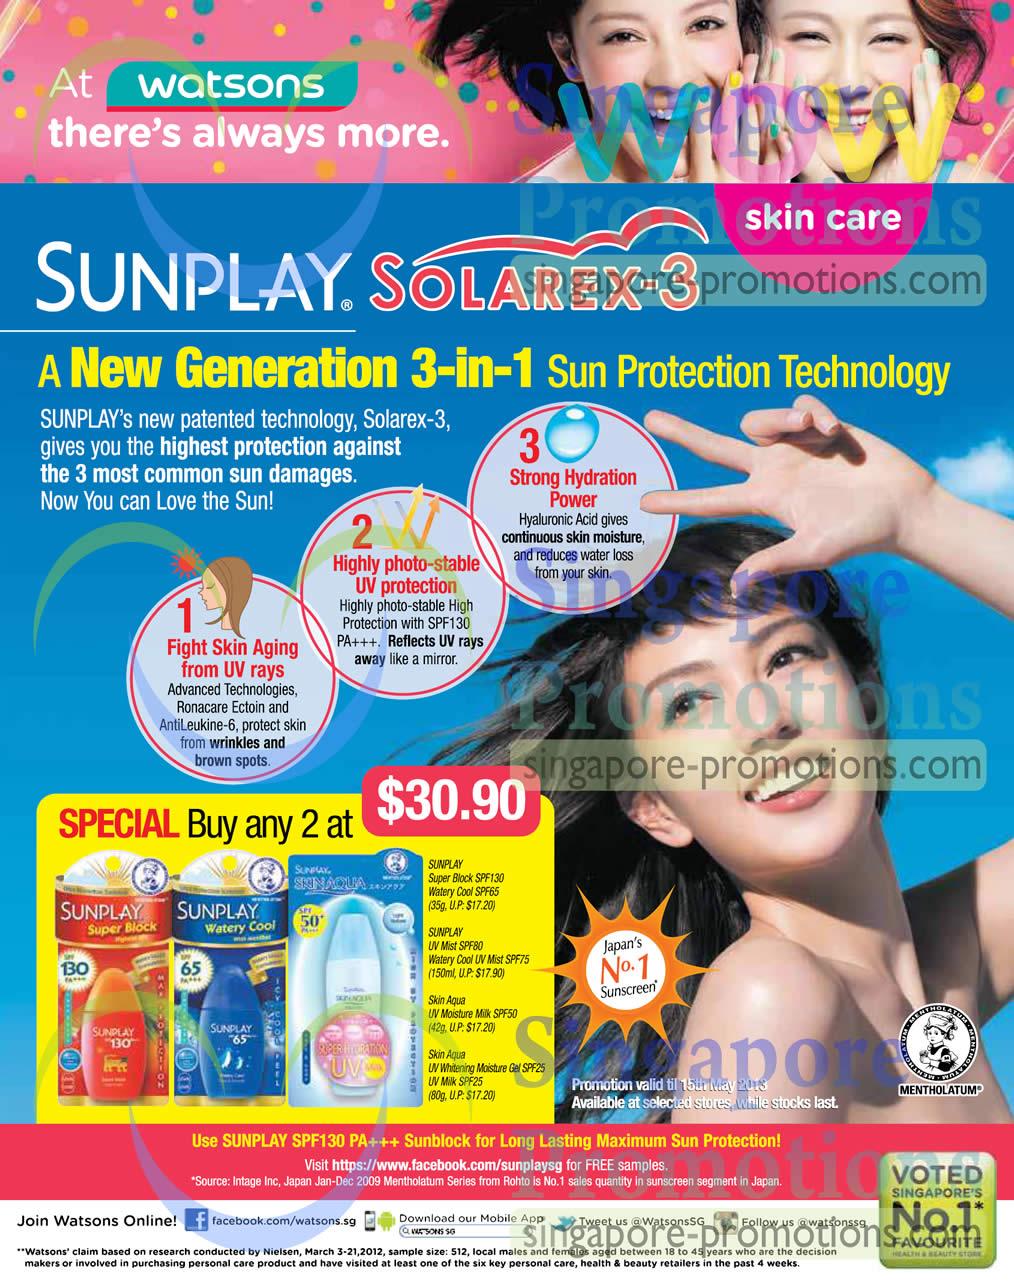 SunPlay Super Block SPF 130, Watery Cool SPF65, SPF65, UV Mist SPF80, Cool UV Mist SPF75